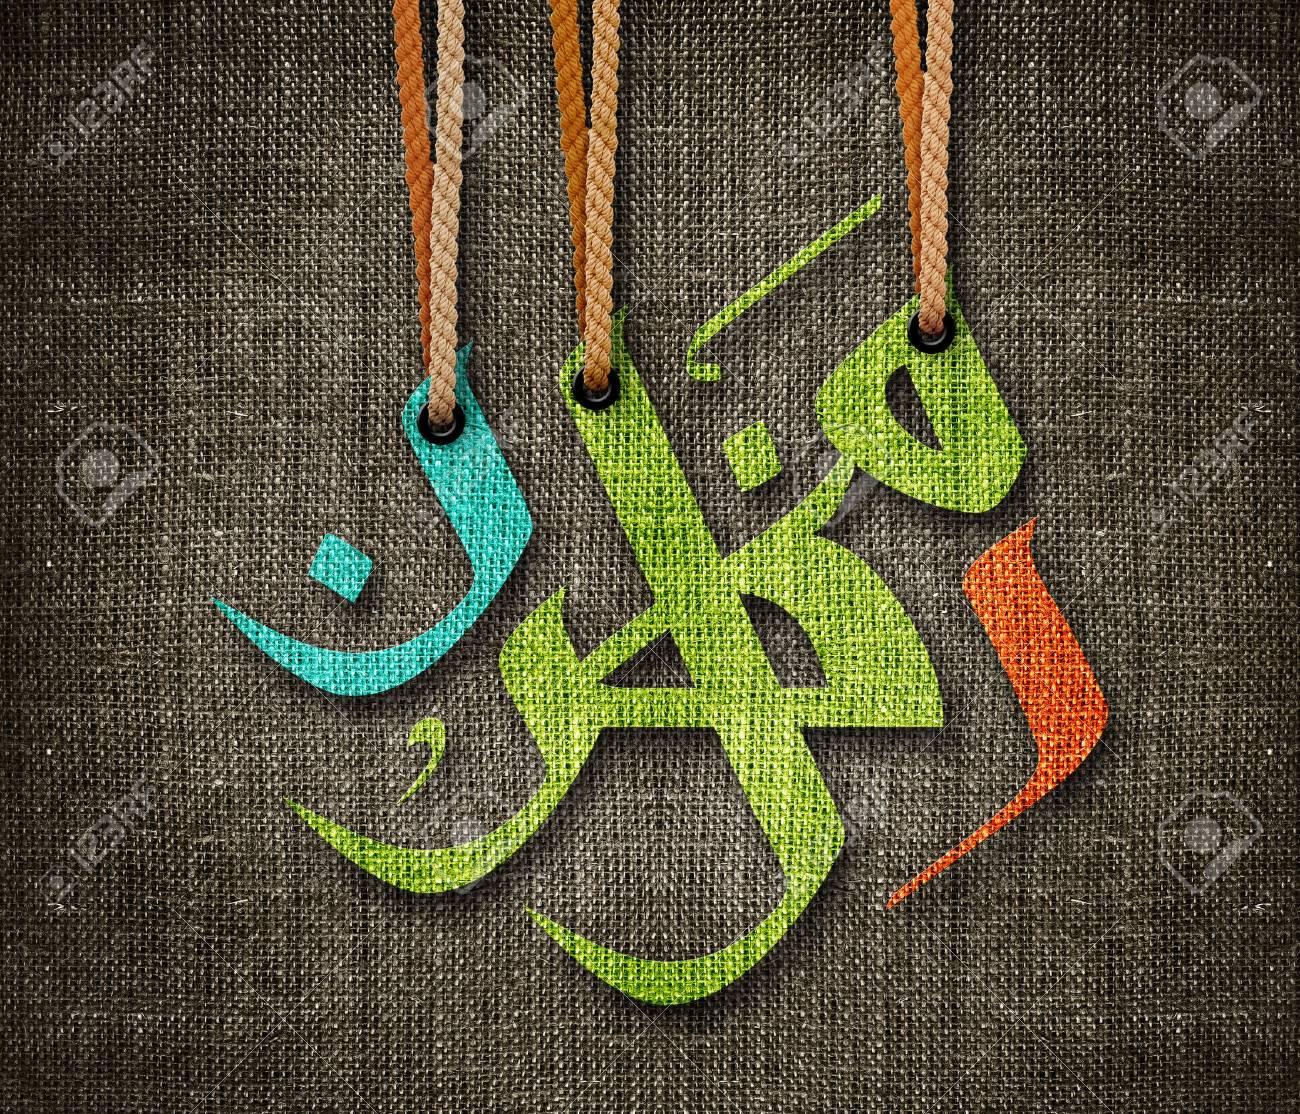 Top Arabic Eid Al-Fitr Greeting - 39373417-the-holy-month-of-muslim-community-festival-ramadan-kareem-and-eid-al-fitr-greeting-card-with-arabic  Gallery_916070 .jpg